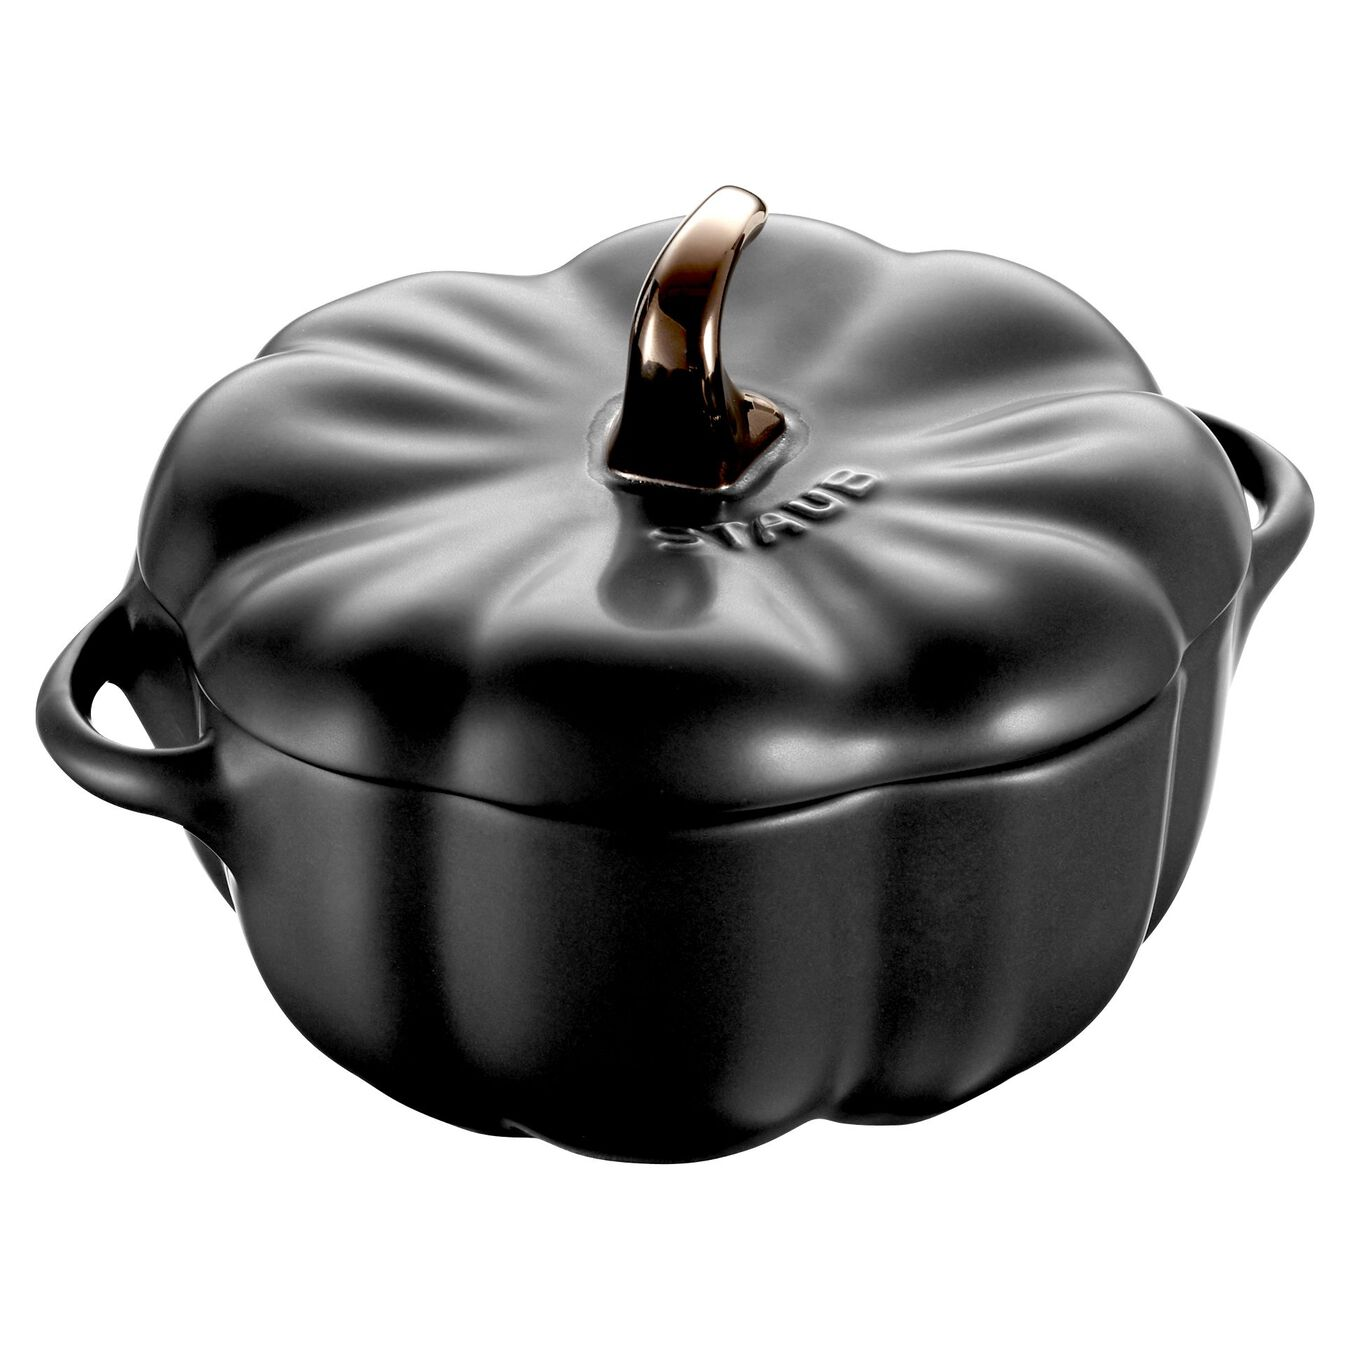 500 ml Ceramic pumpkin Cocotte, Black,,large 1